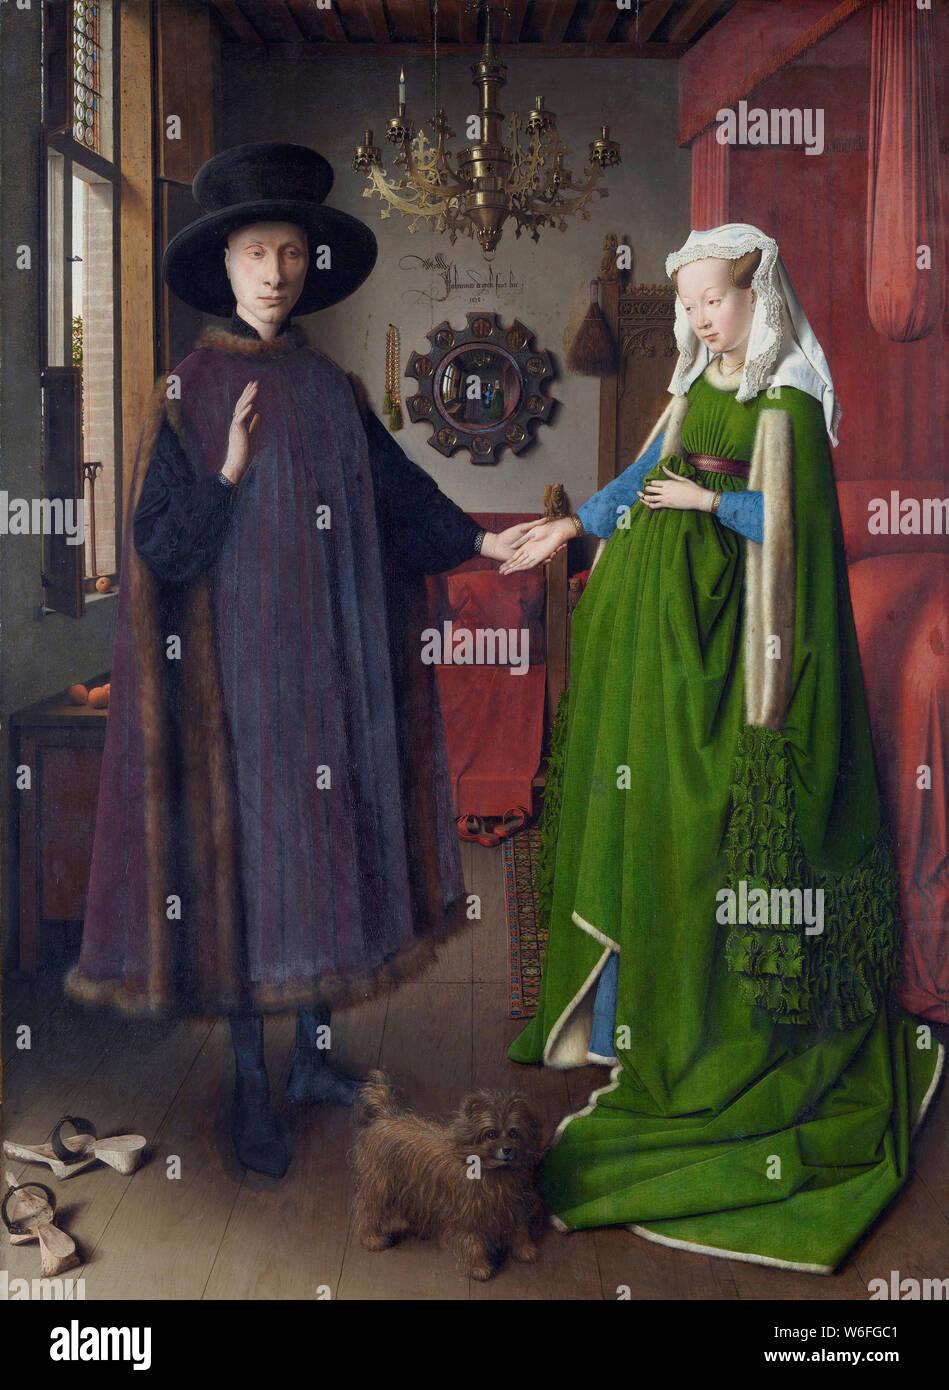 Il Ritratto di Arnolfini, 1434. Artista: Eyck, Jan van (1390-1441) Foto Stock